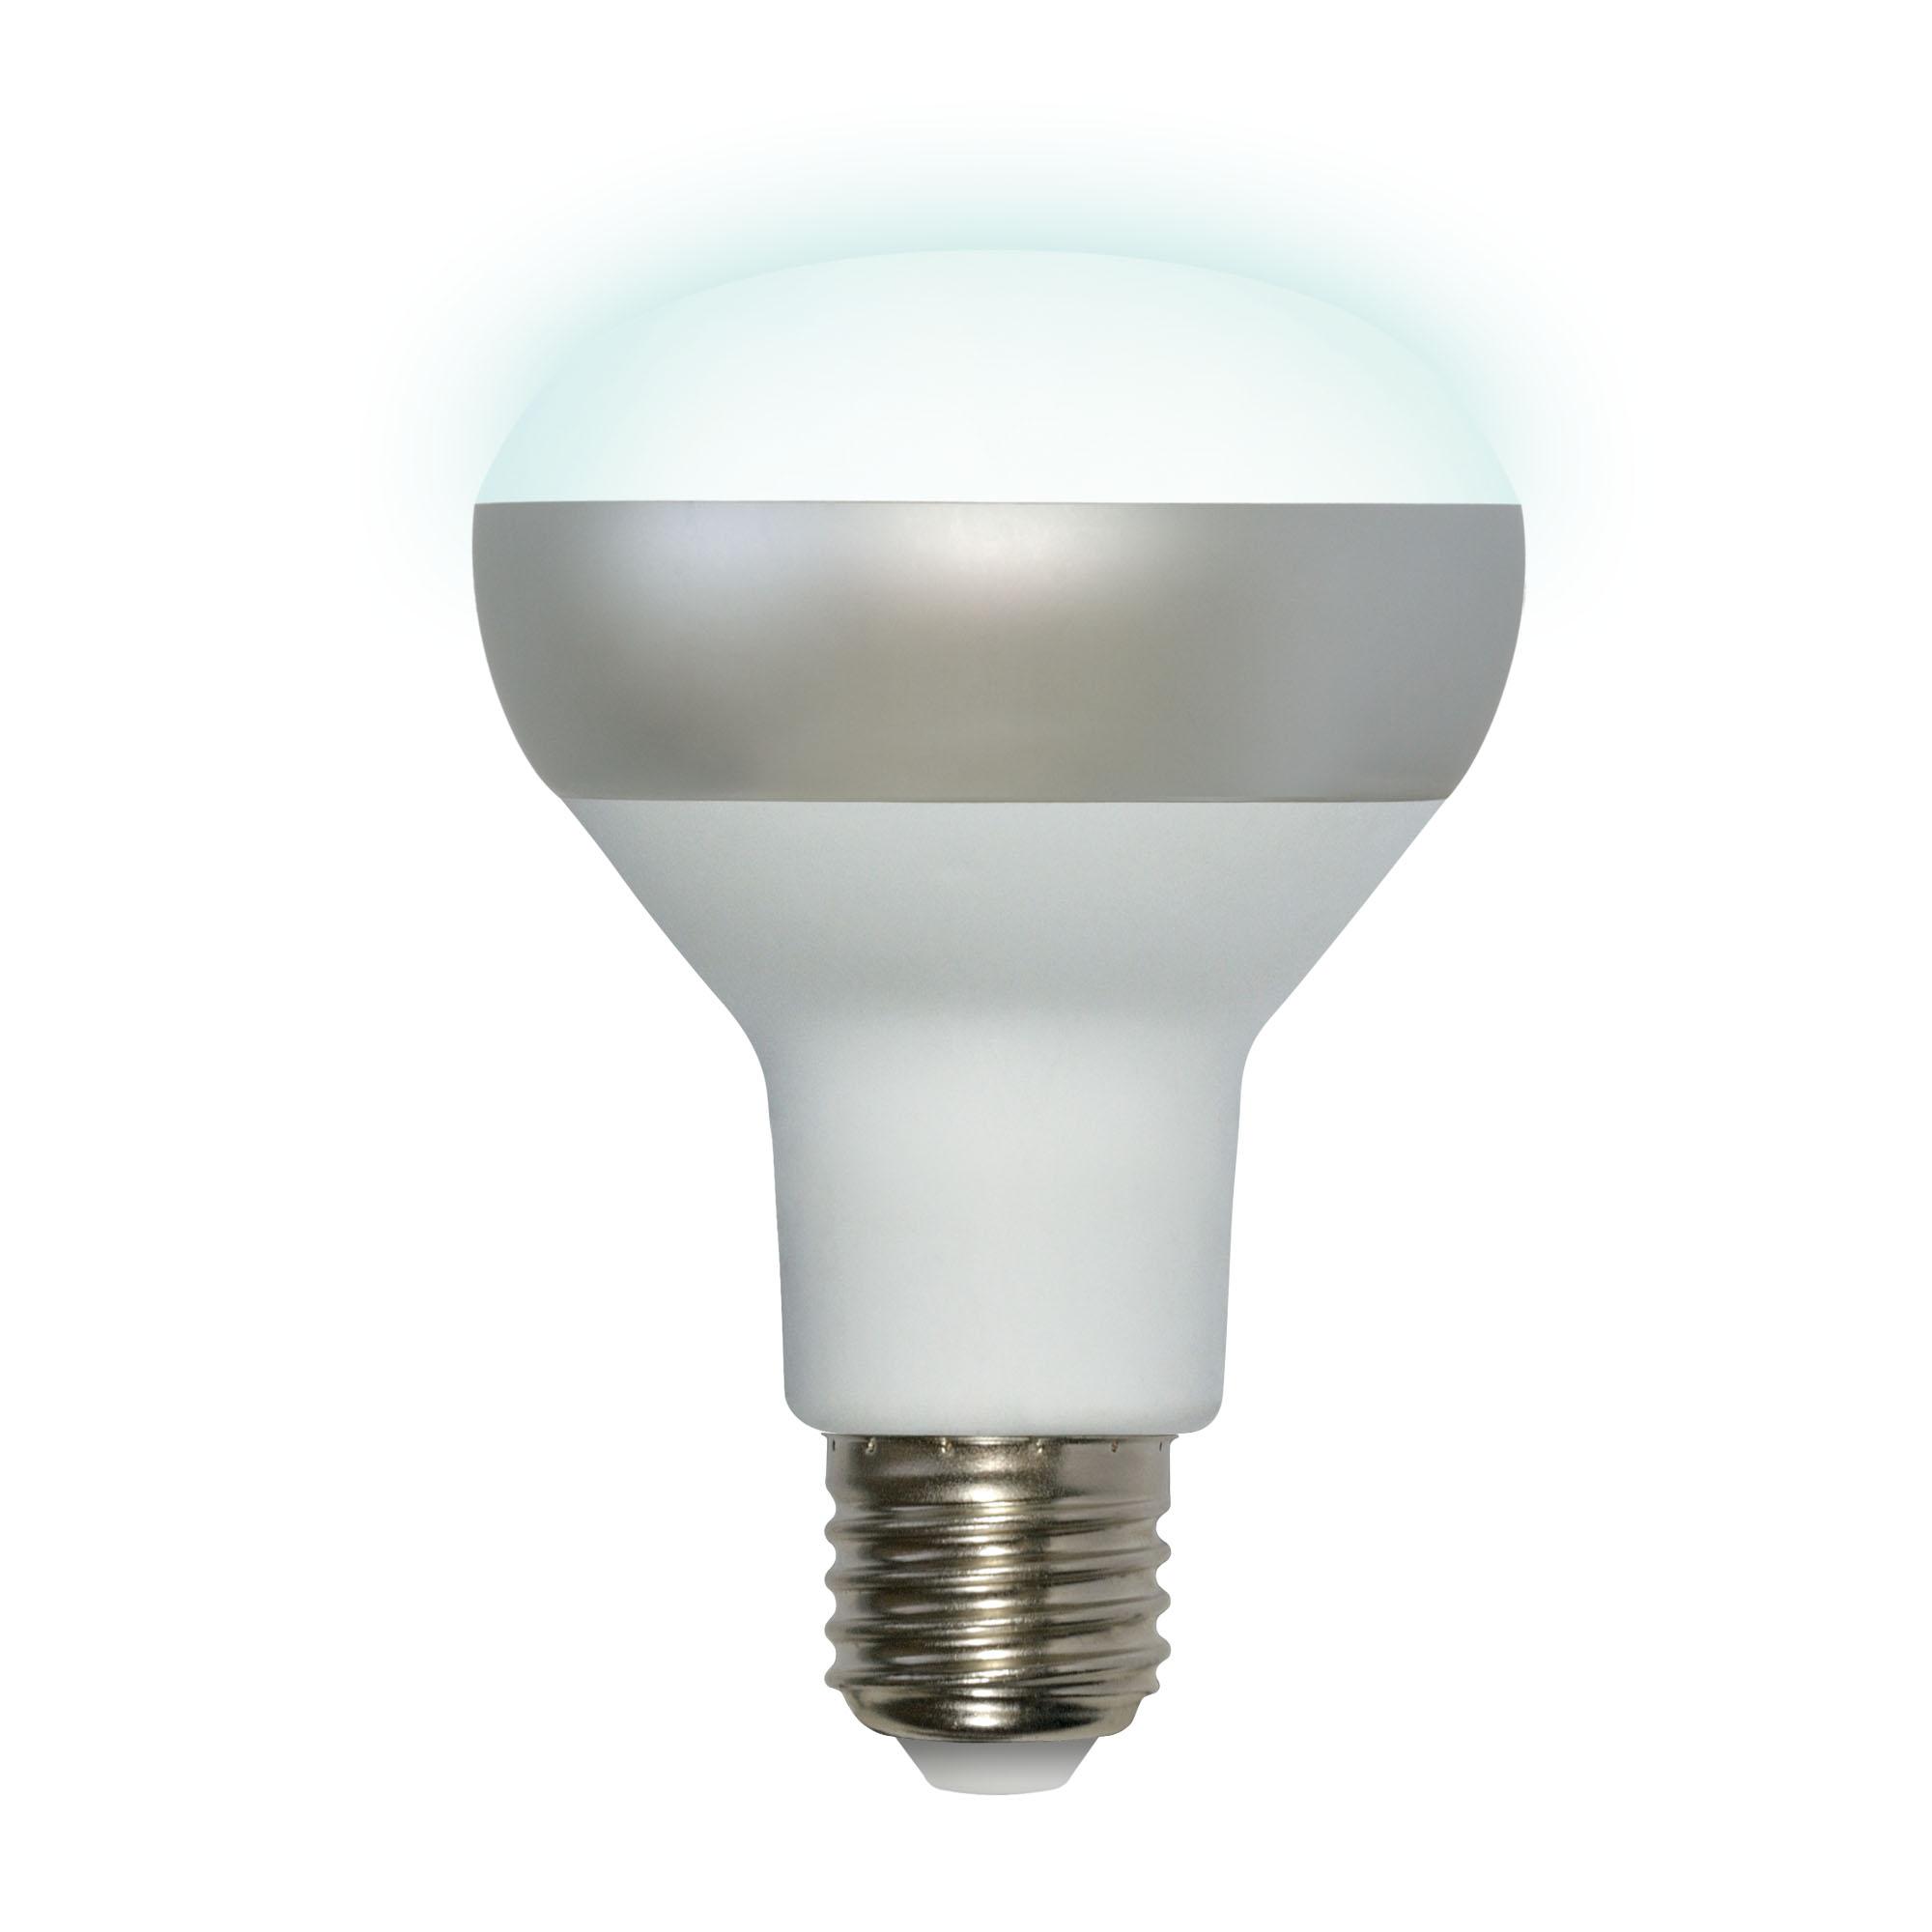 Лампа энергосберегающая Uniel Esl-rm80 fr-a15/2700/e27 20шт electrolux esl 64052